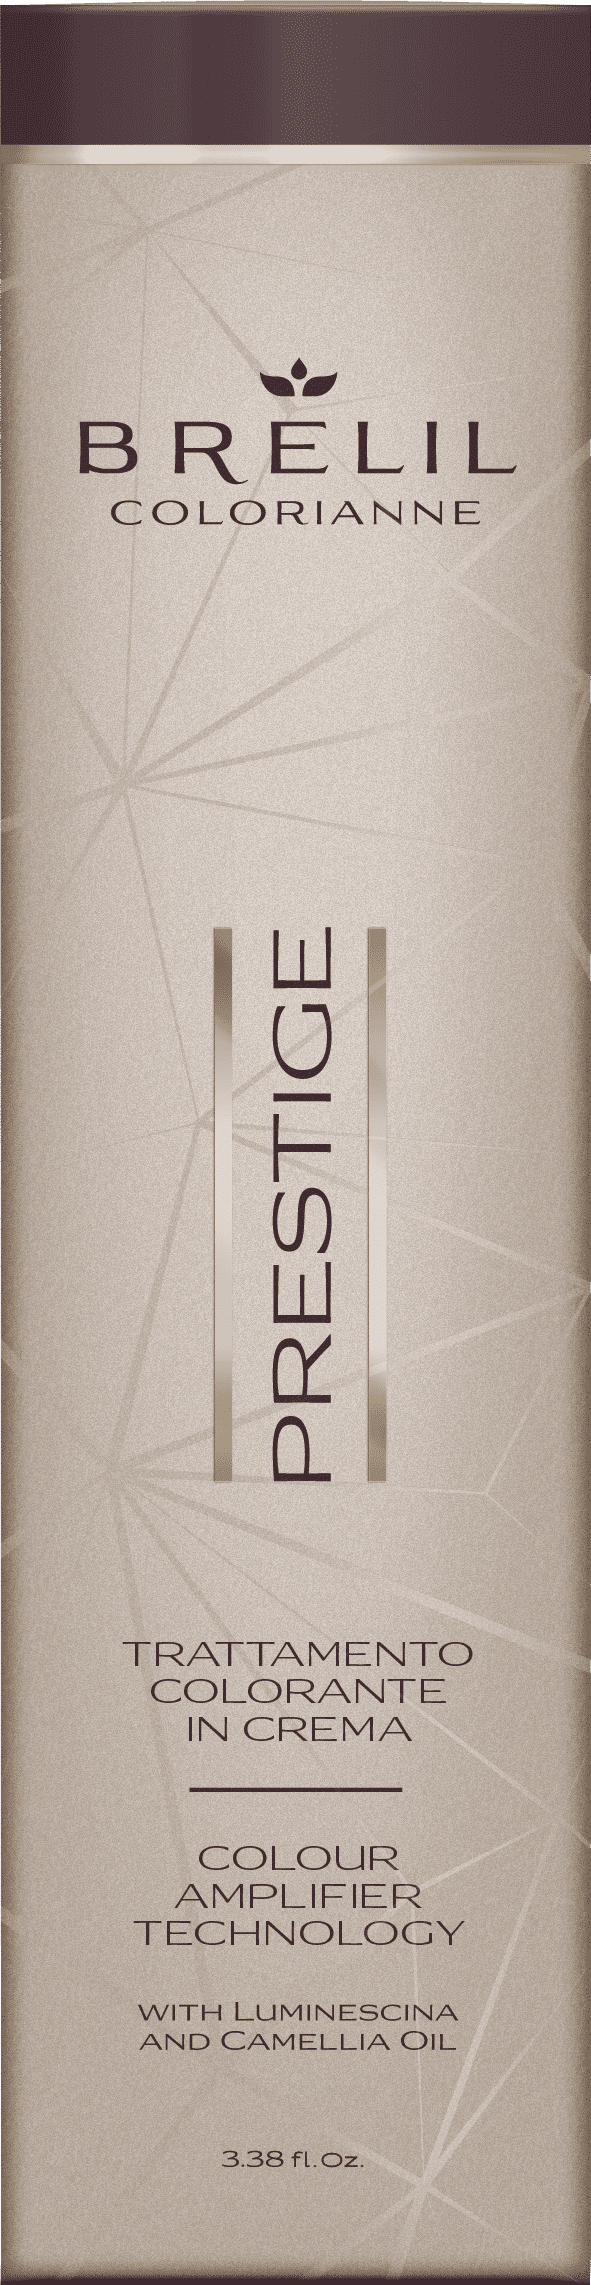 prestige render astuccio - Краска для волос Колорианн Классик, 100 мл